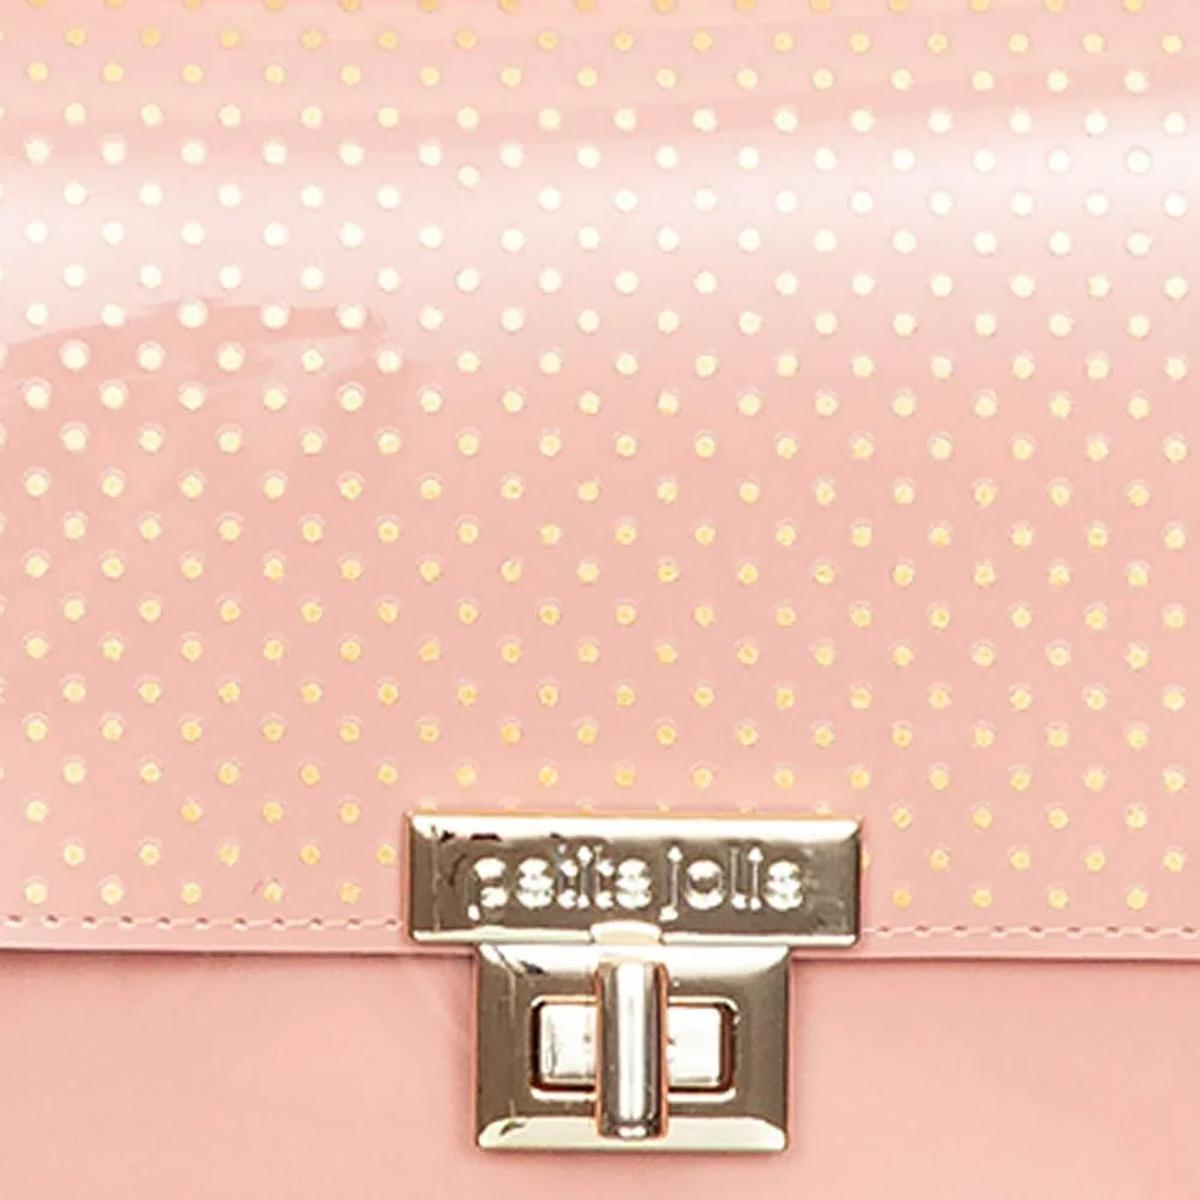 Bolsa Petite Jolie PJ10126 One